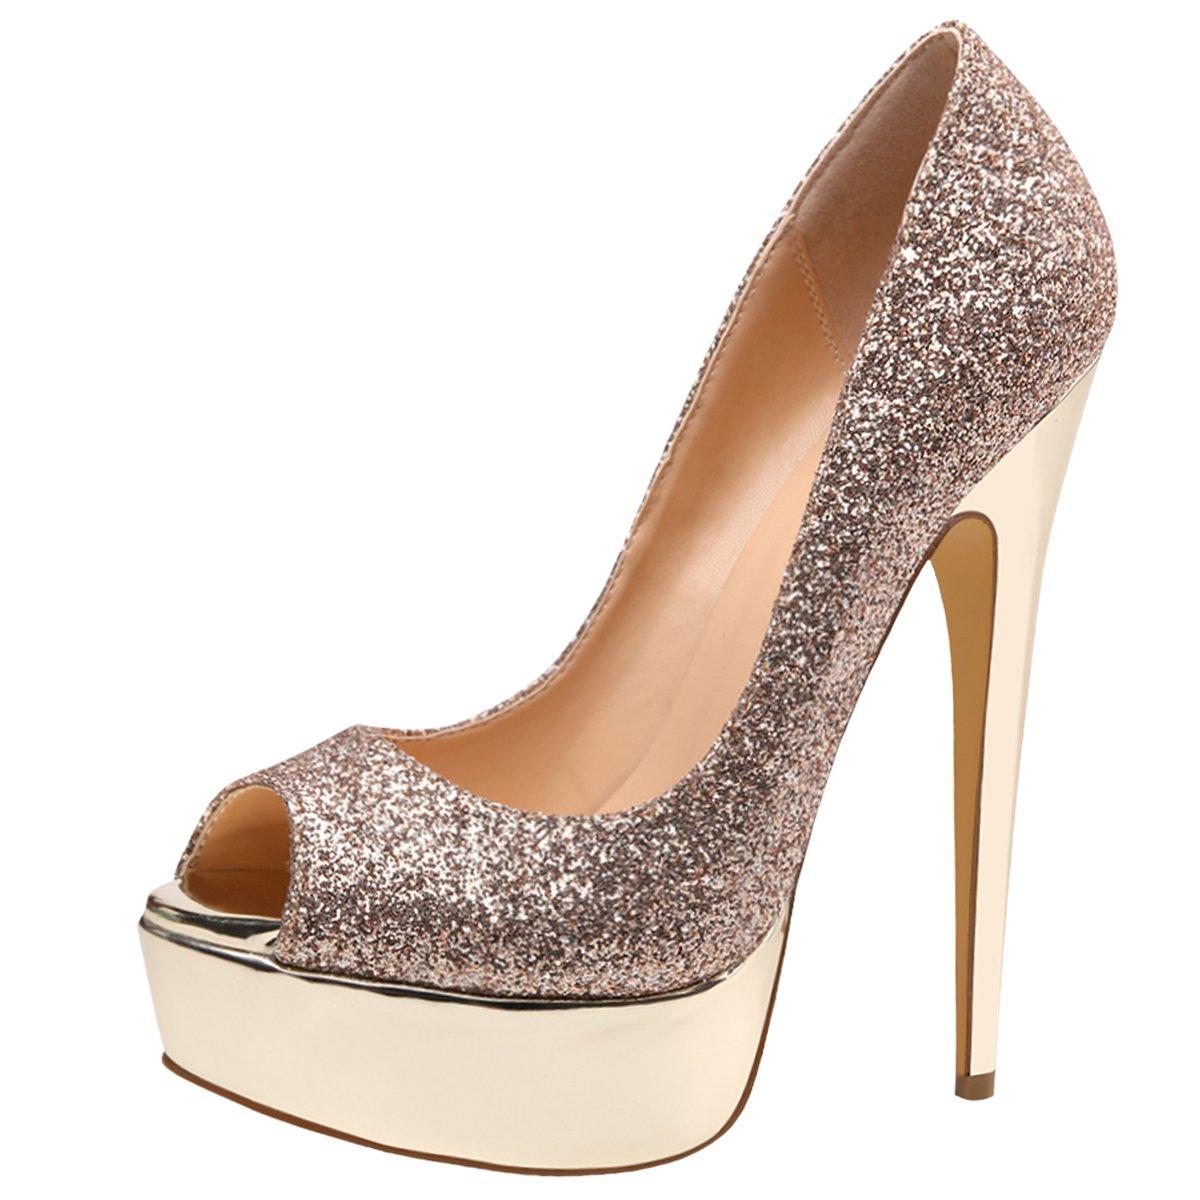 onlymaker Platform Pumps for Women, Peep Toe High Heels Slip On Heeled Shoes Dress Party Pumps Gold US 6